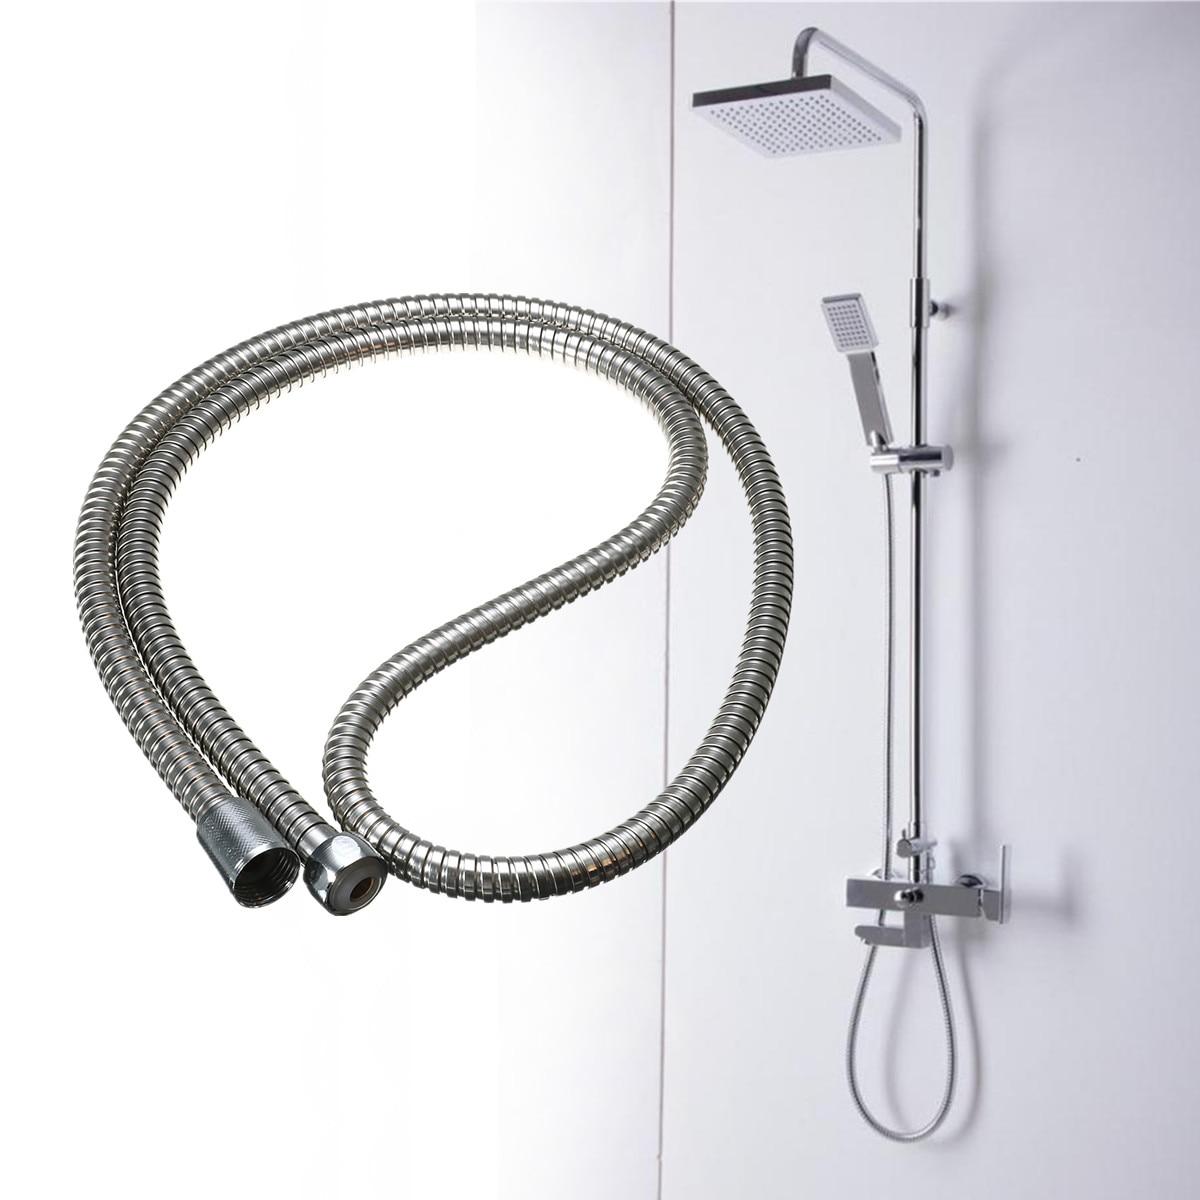 1.5m Stainless Steel Flexible Shower Hose Extension Chrome Plumbing ...